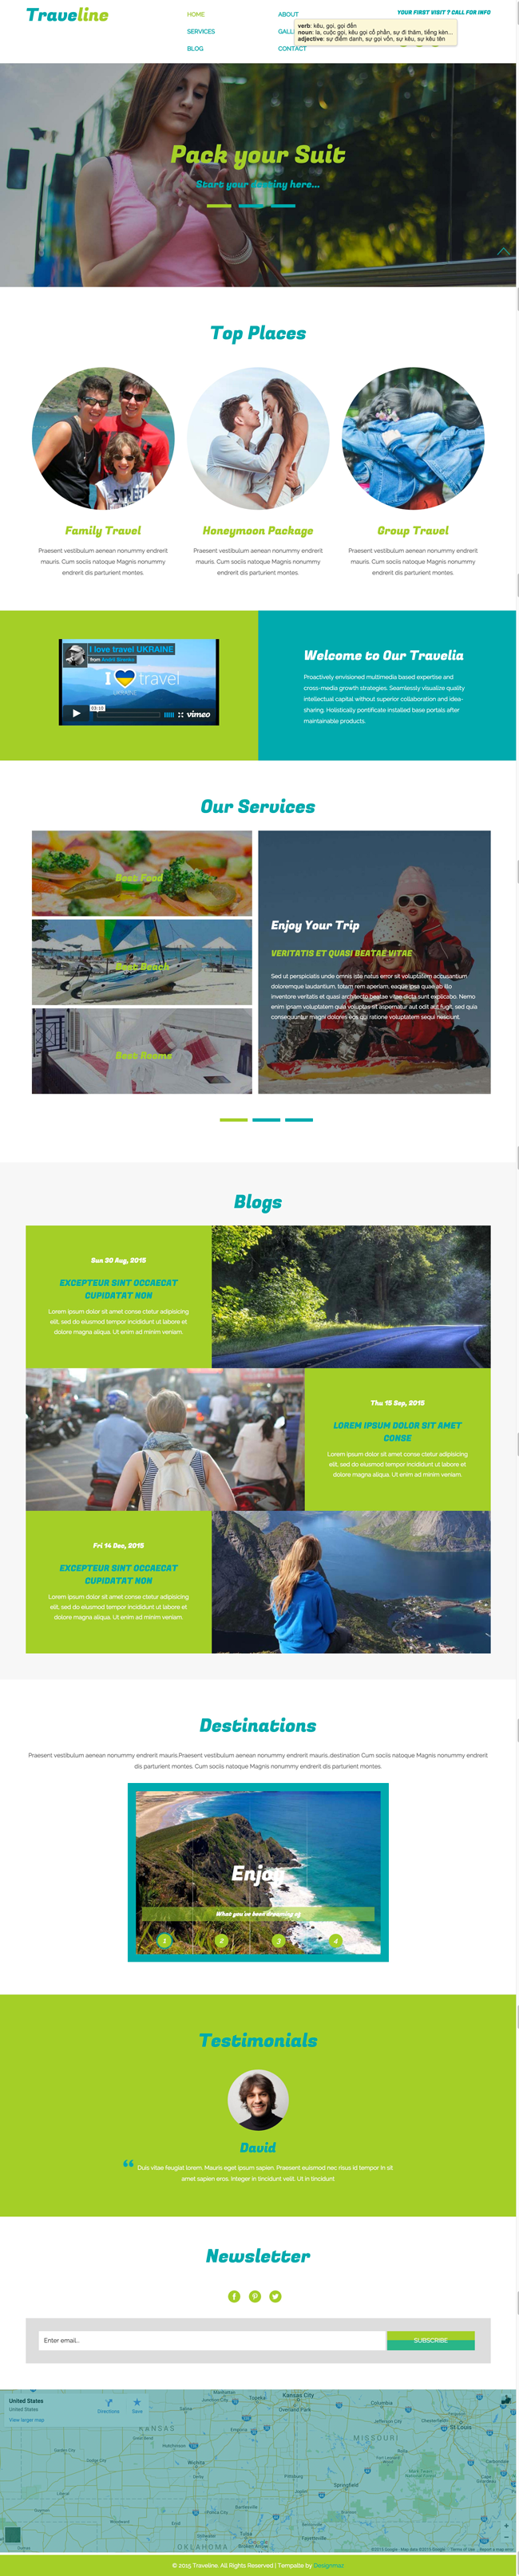 Traveline - Free Responsive HTML5 Travel Template